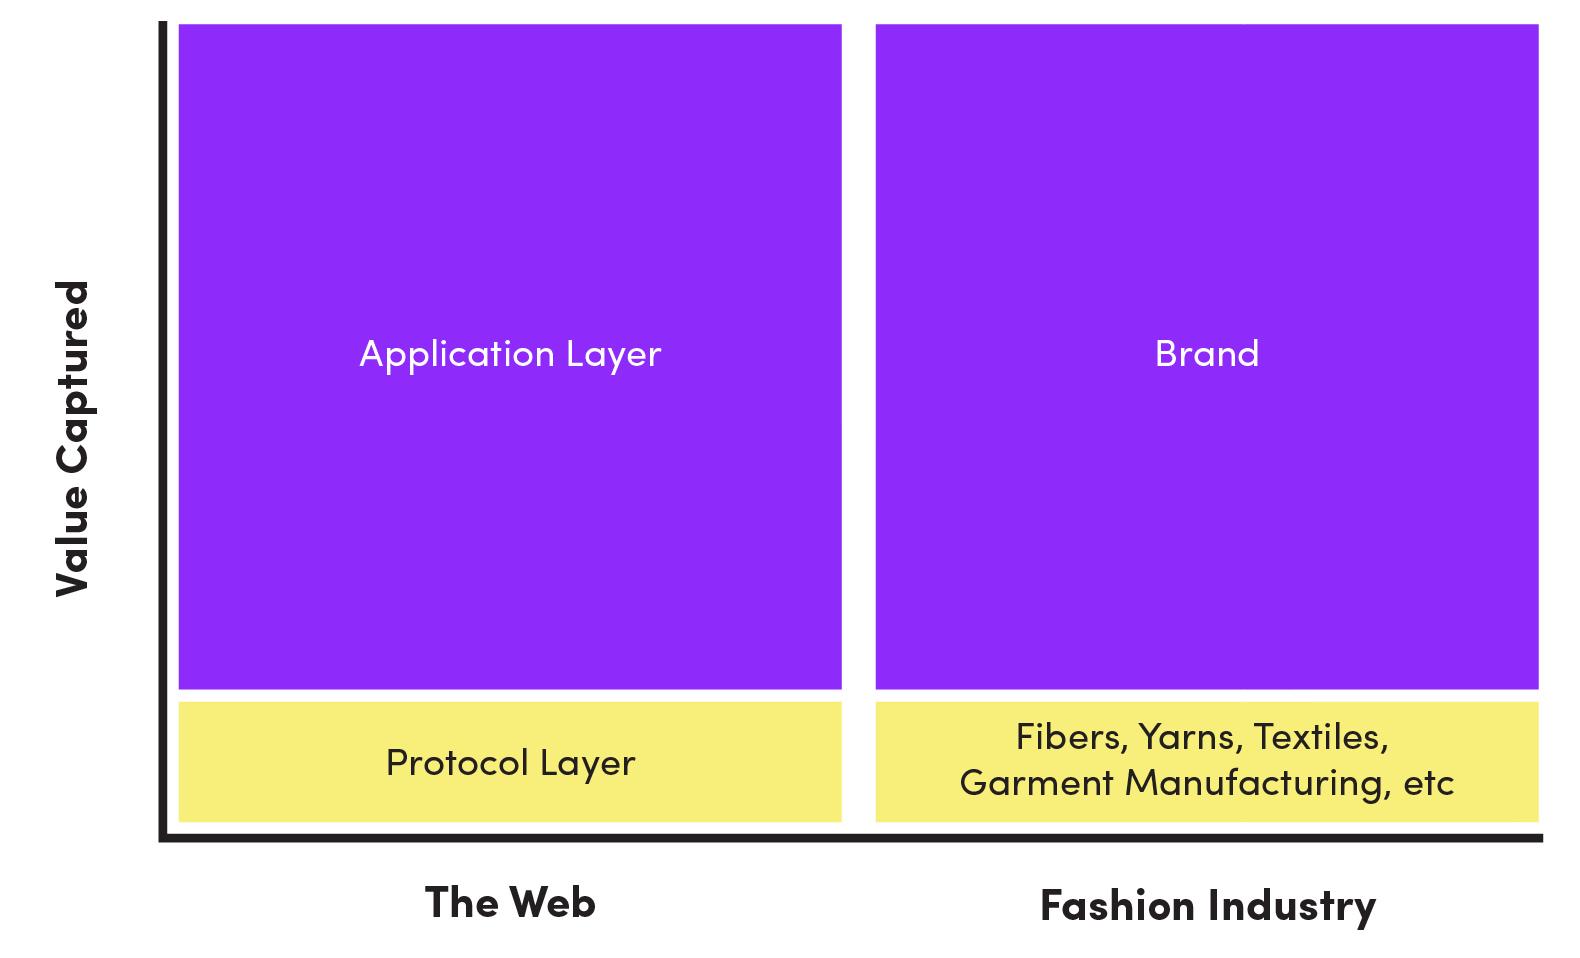 web and fashion value capture graph